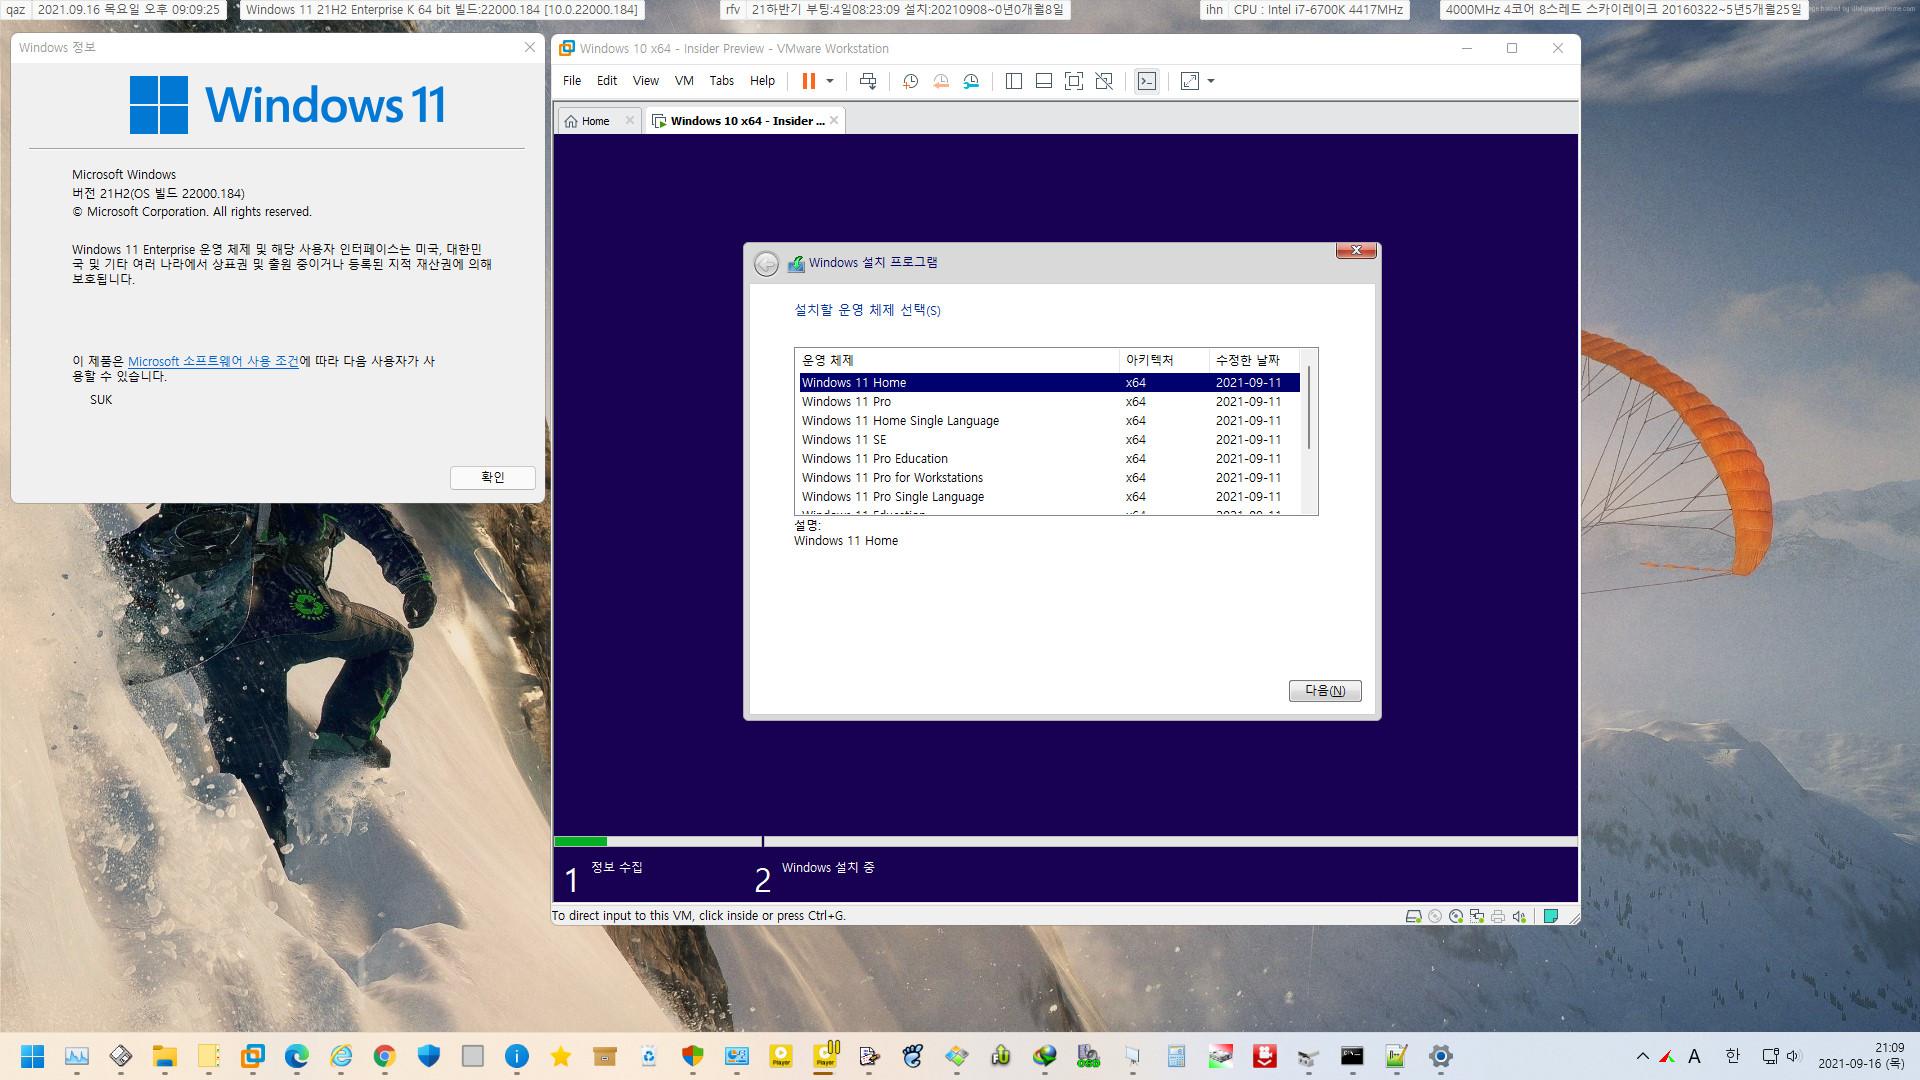 Windows 11 인사이더 프리뷰 - 버전 Dev (OS 빌드 22458.1000) 나왔네요 - 개발자 채널 - 한글 UUP를 ISO로 만드는데 실패하여 윈도우 업데이트로 UUP 다운로드하여 ISO 만들었습니다. 한글 64비트 모든 에디션 + 우회  2021-09-16_210925.jpg